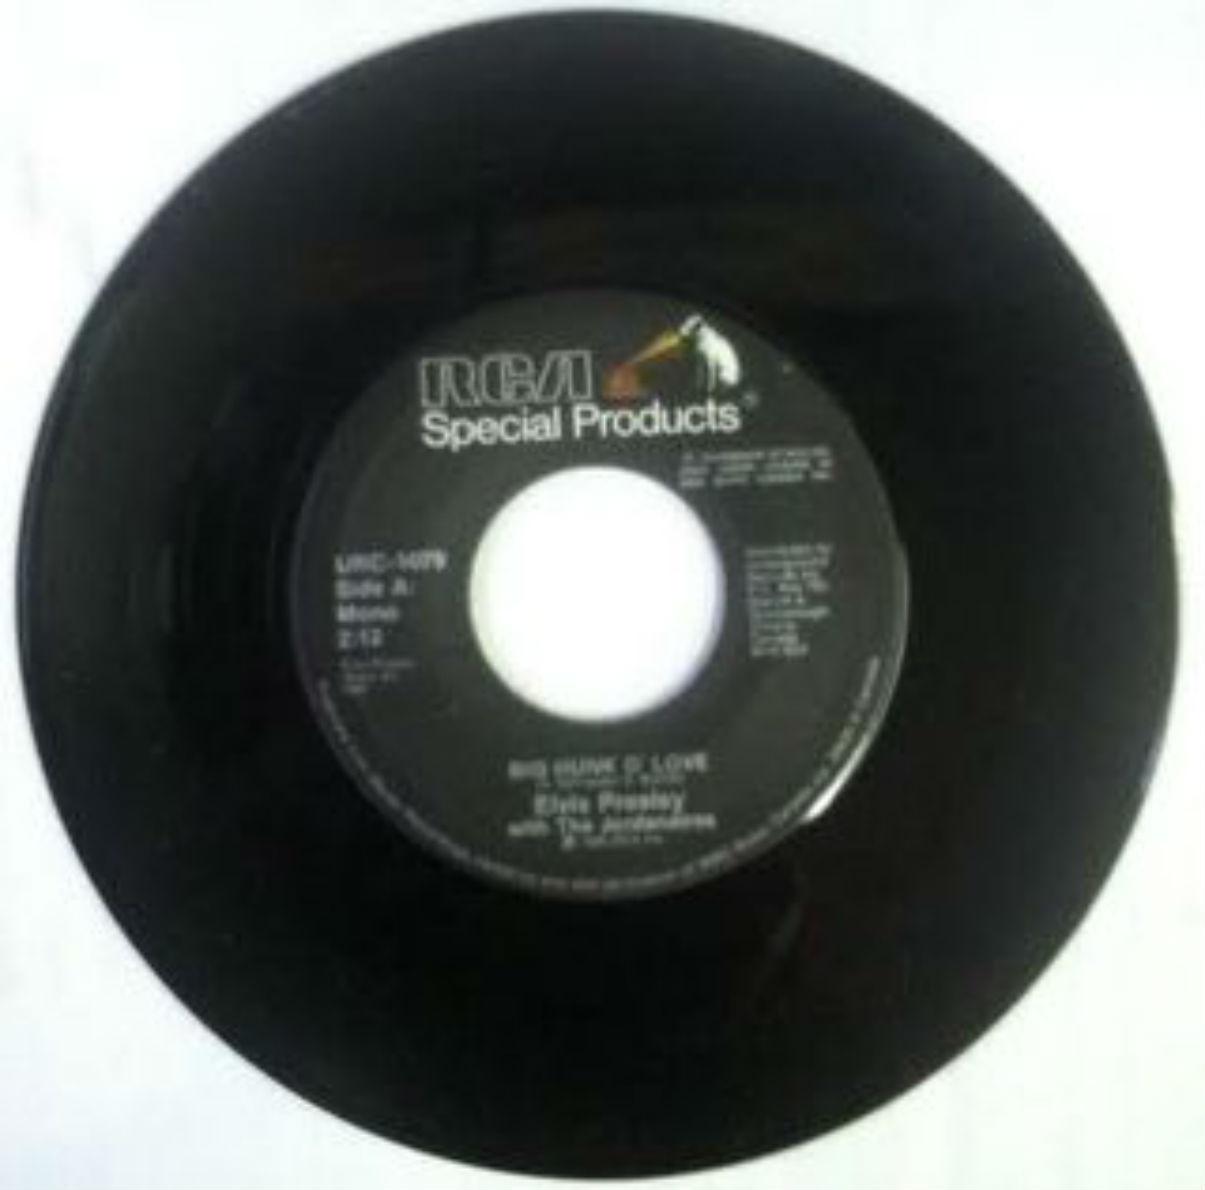 Elvis Presley - Big Hunk O' Love